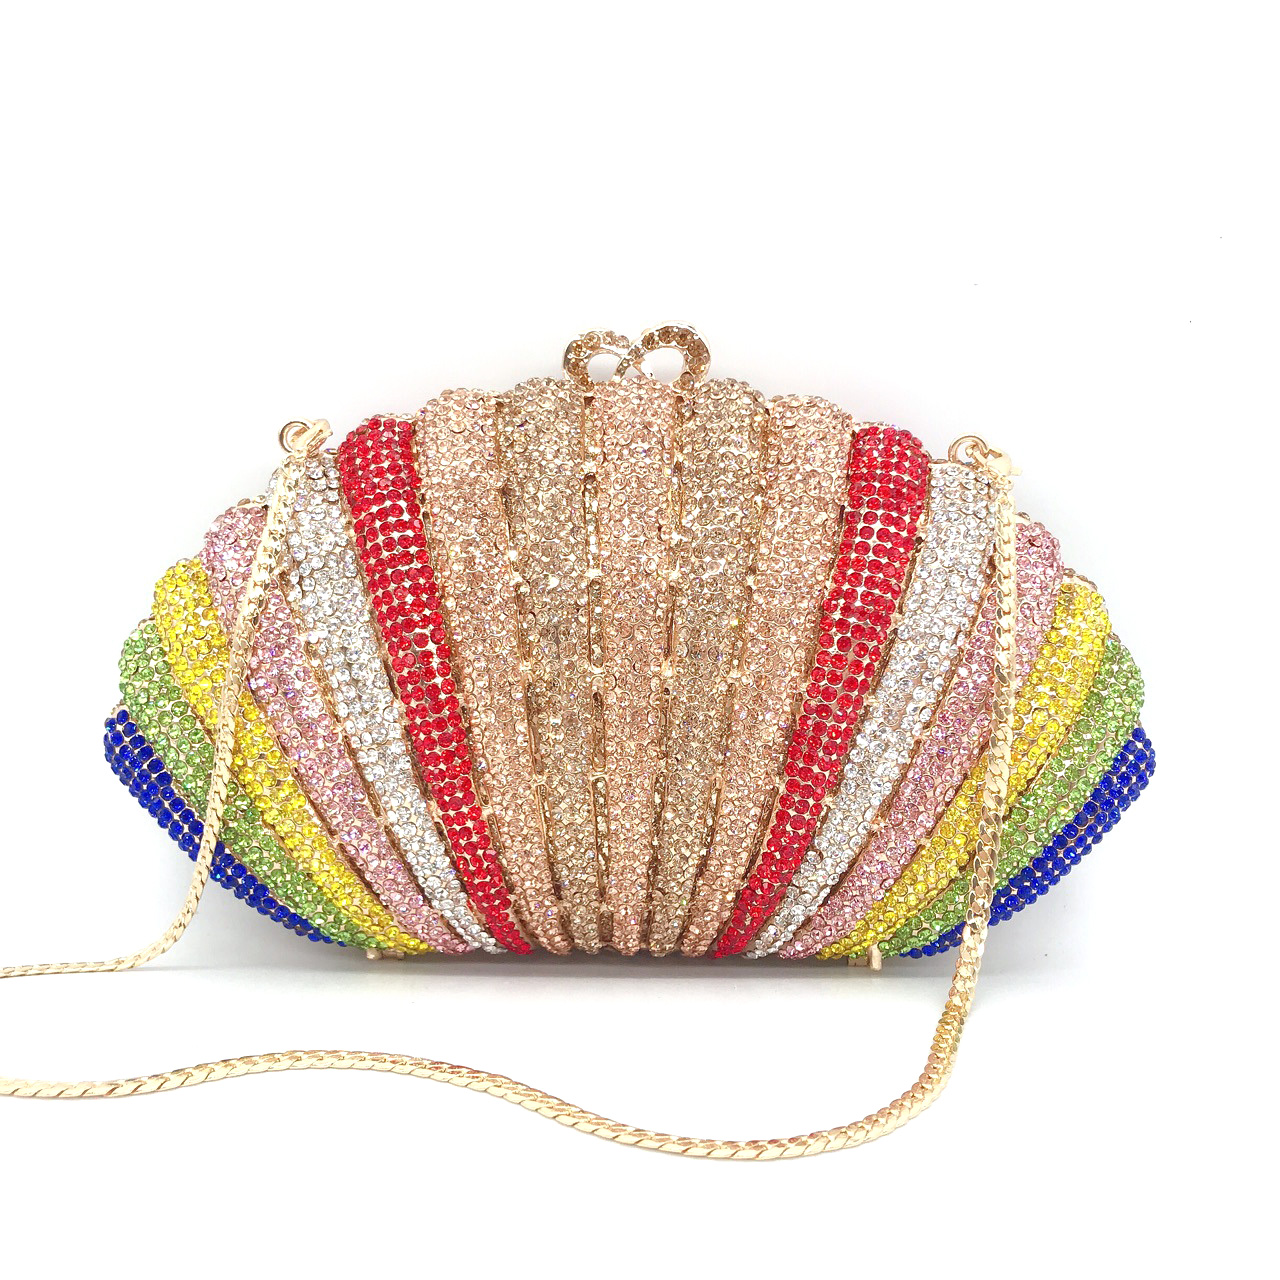 Bag For Women Rainbow Rhinestone Women Crystal Evening Clutches Bags Minaudiere Handbags Wedding Clutch Brides Purse-BeeInFly